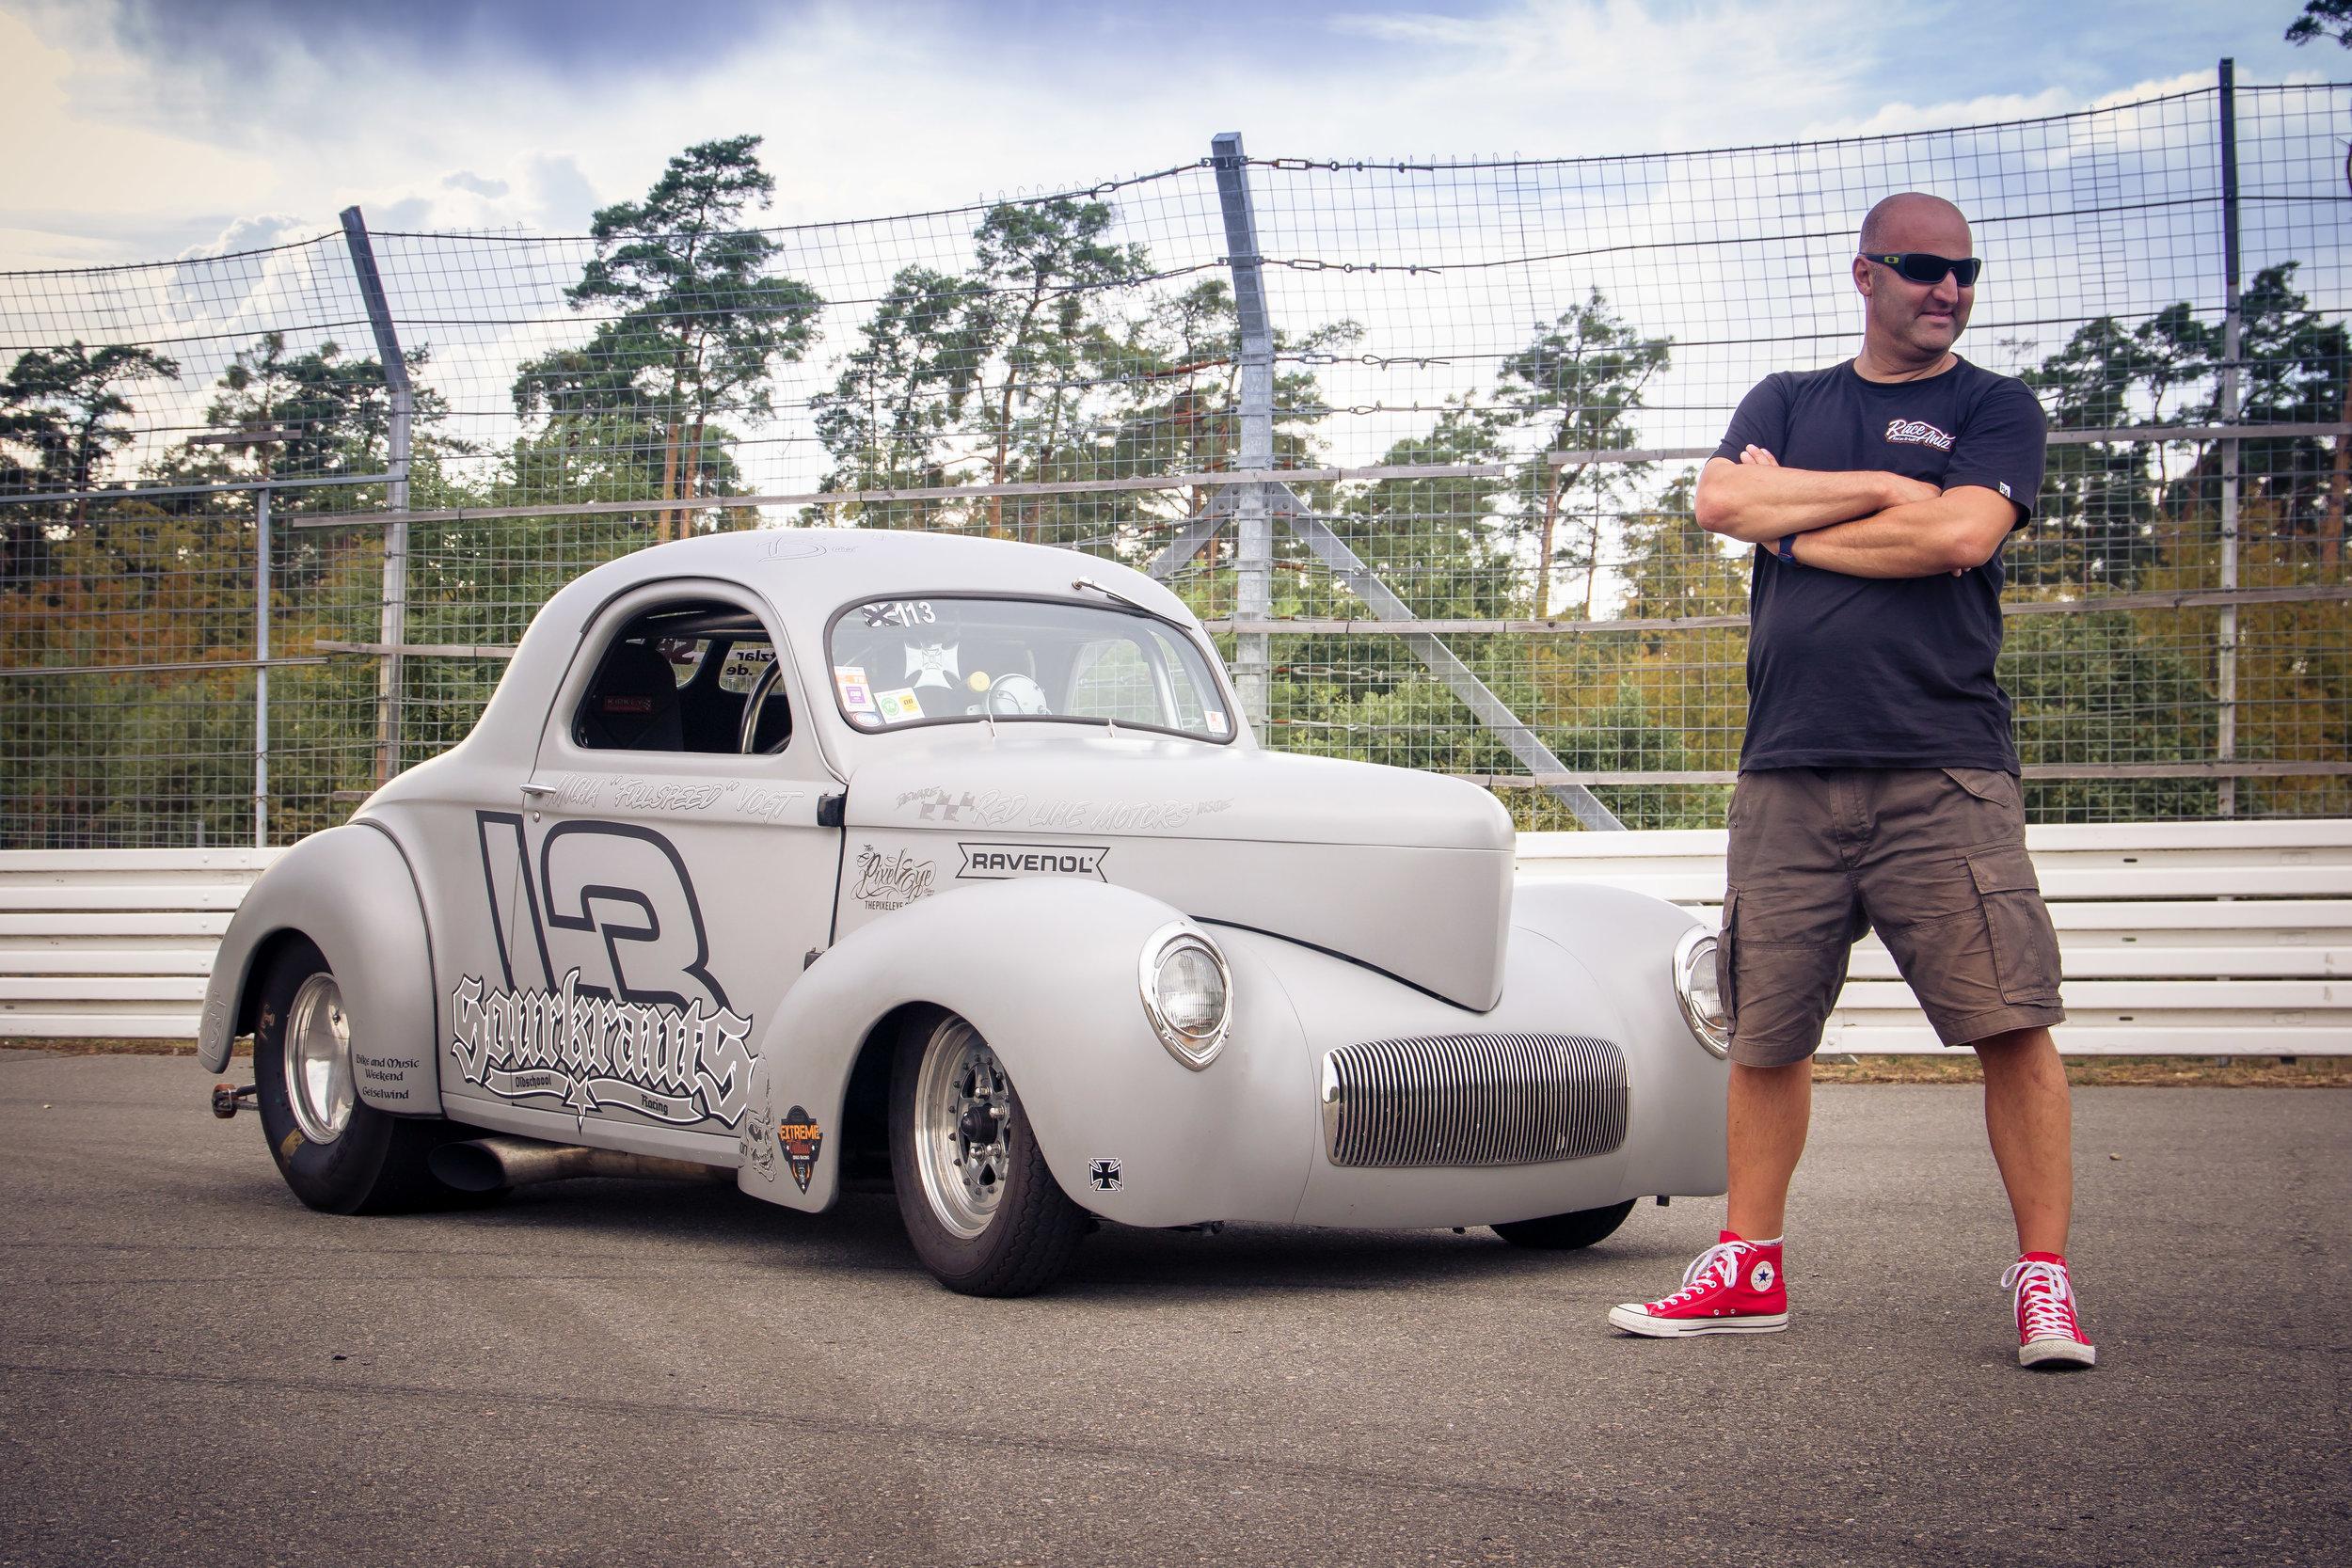 Race Antz NitrolympX 2018-9067.jpg